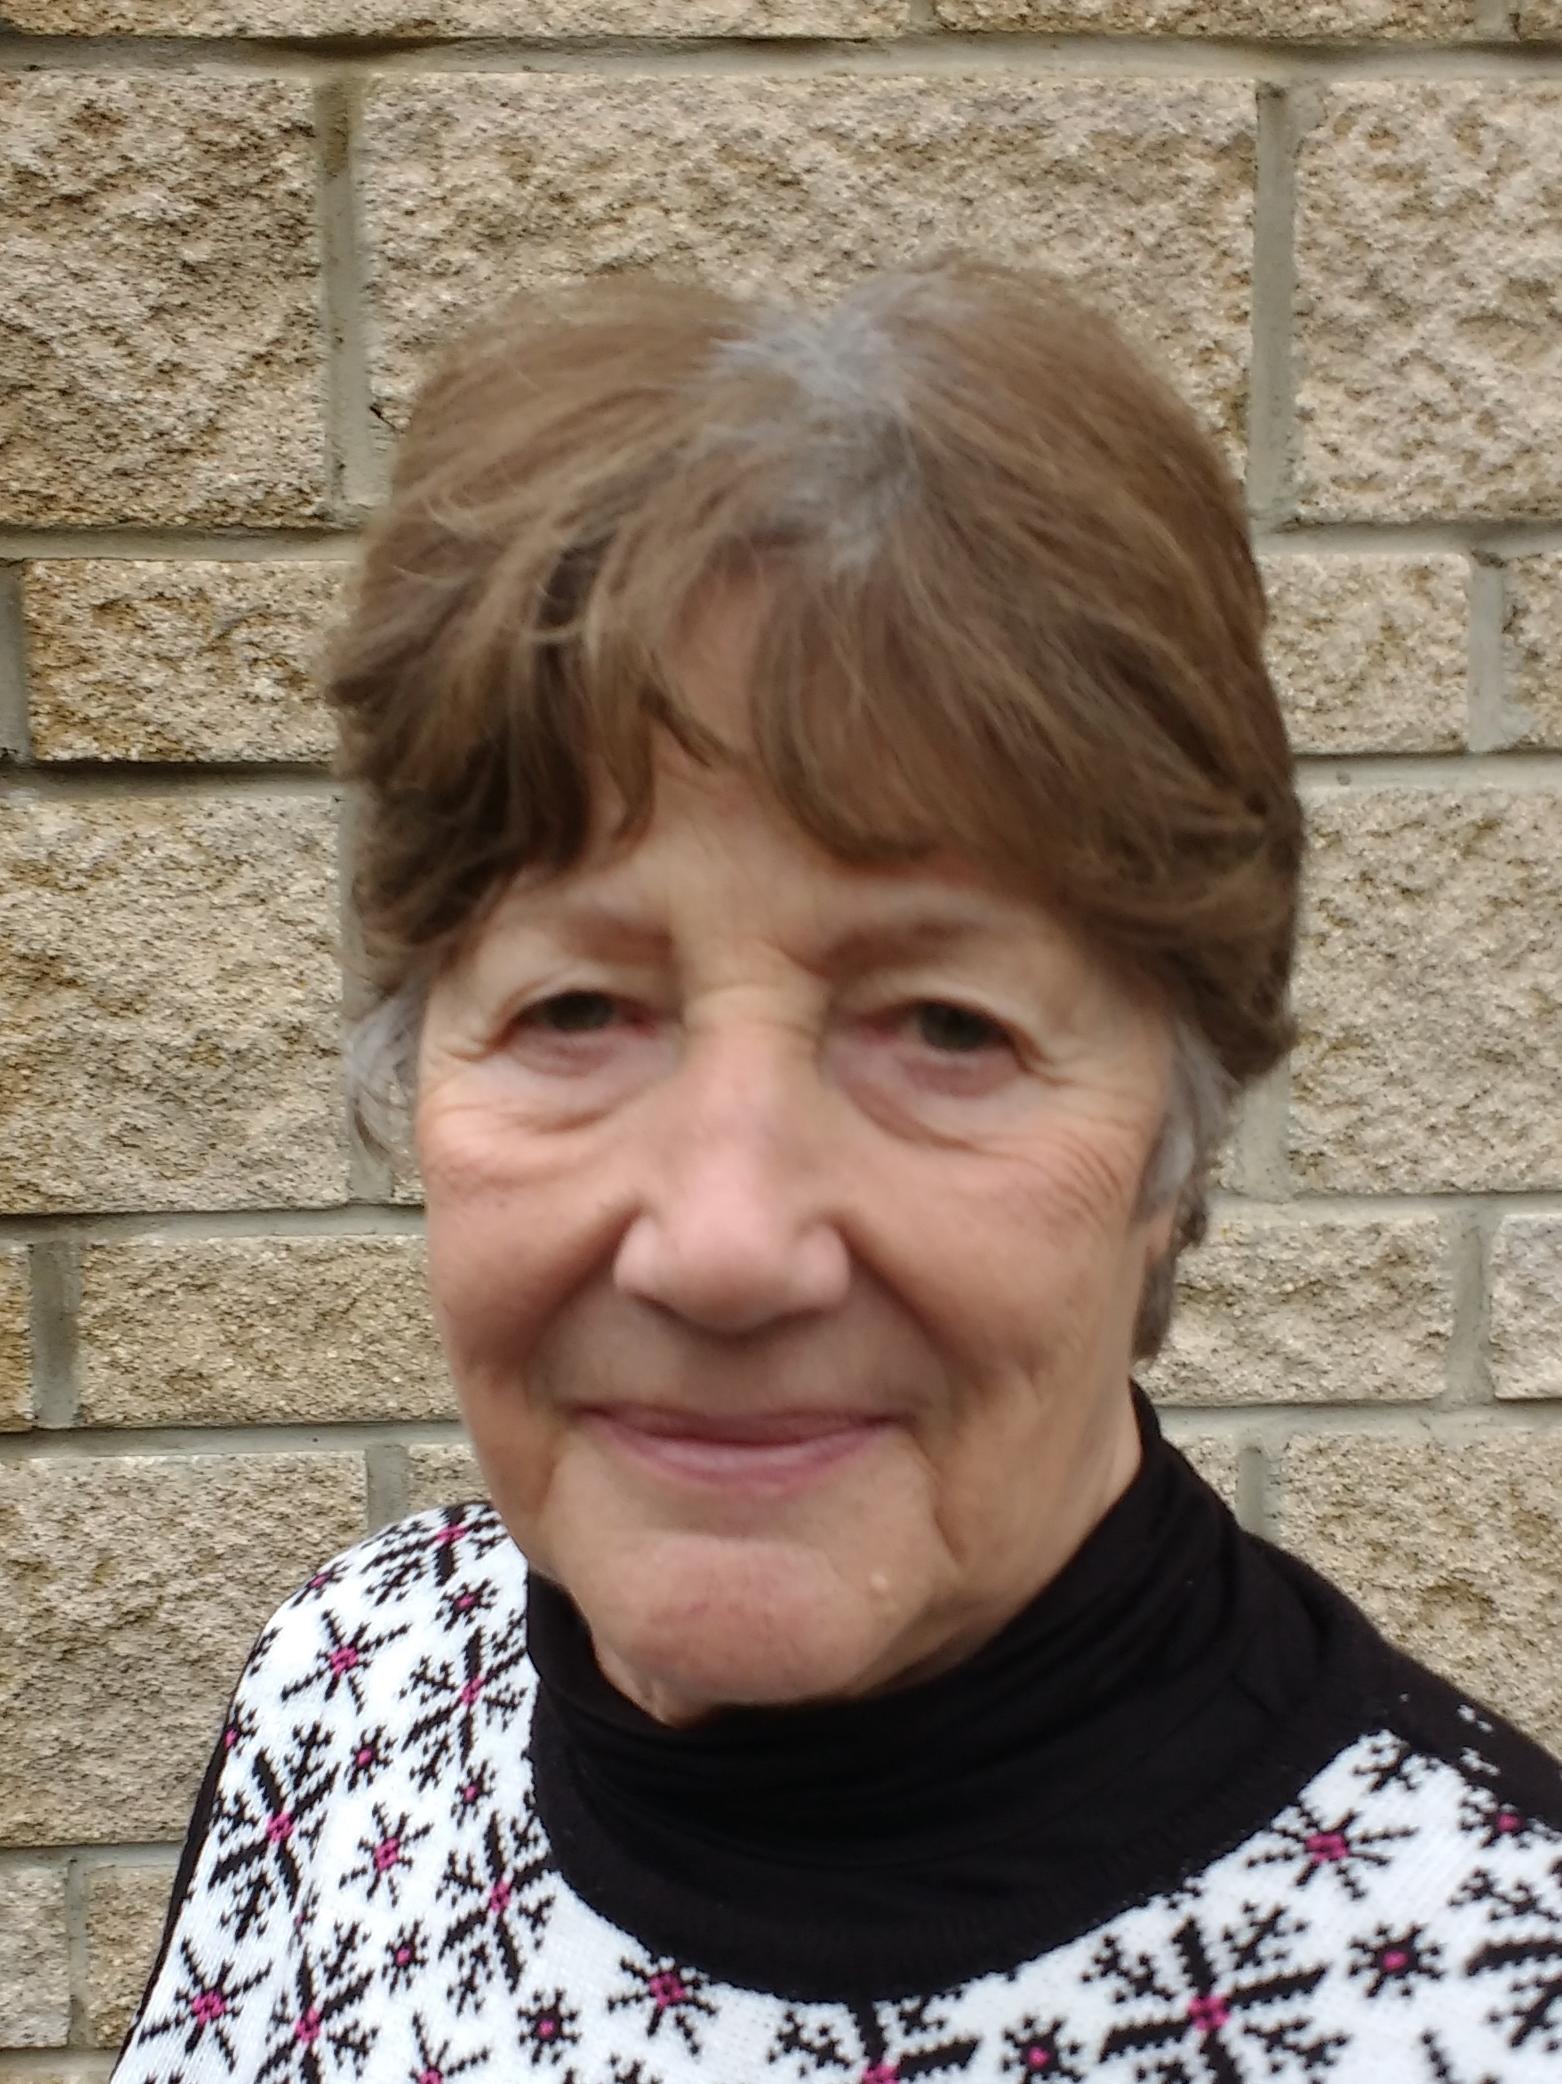 Pat Carlen